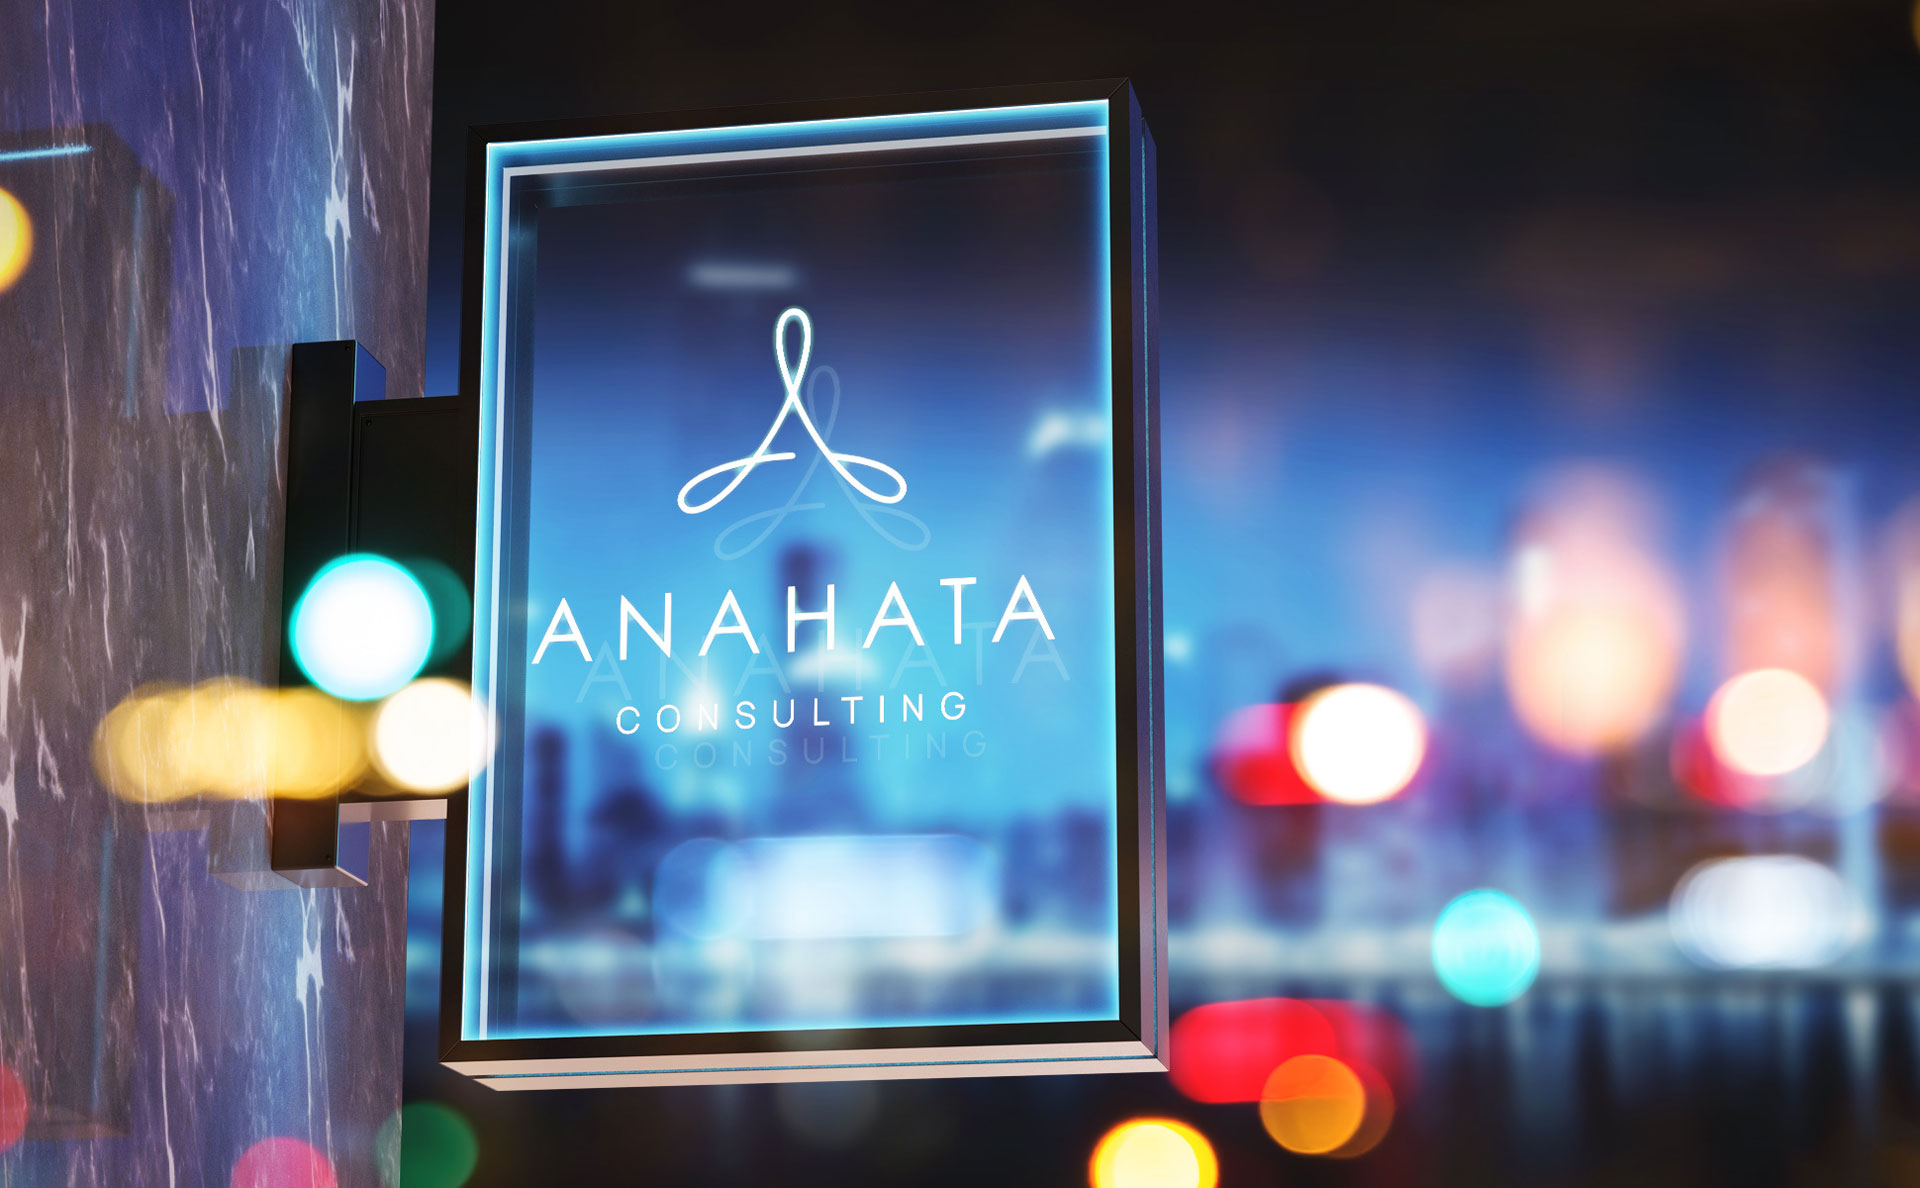 ANAHATA-projet-mockup-8.jpg